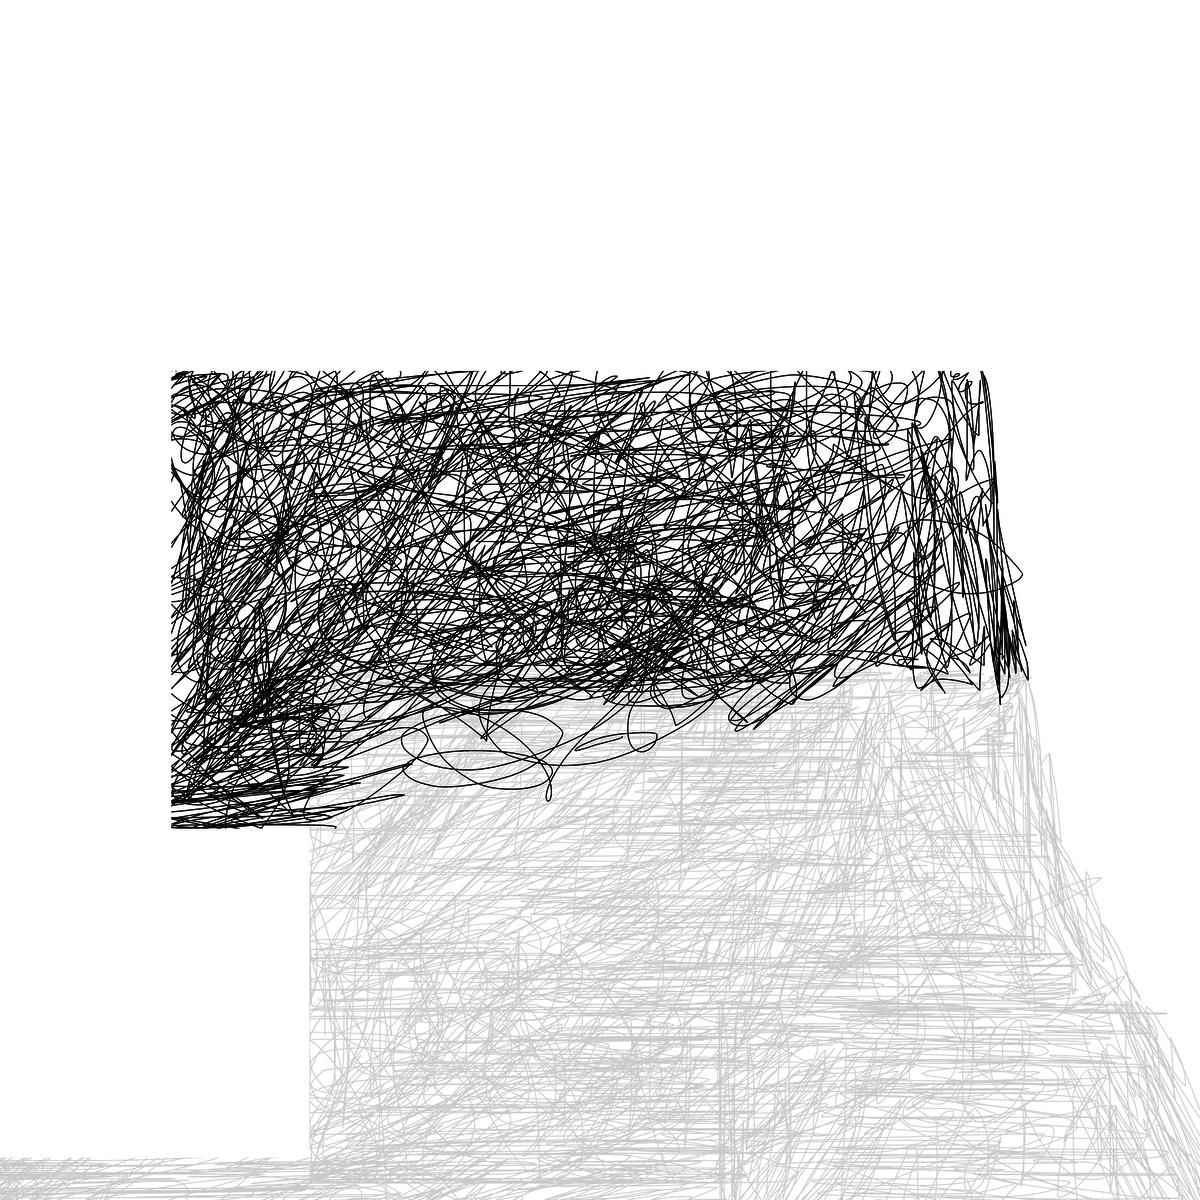 BAAAM drawing#23373 lat:46.5209999084472660lng: 6.6338953971862790